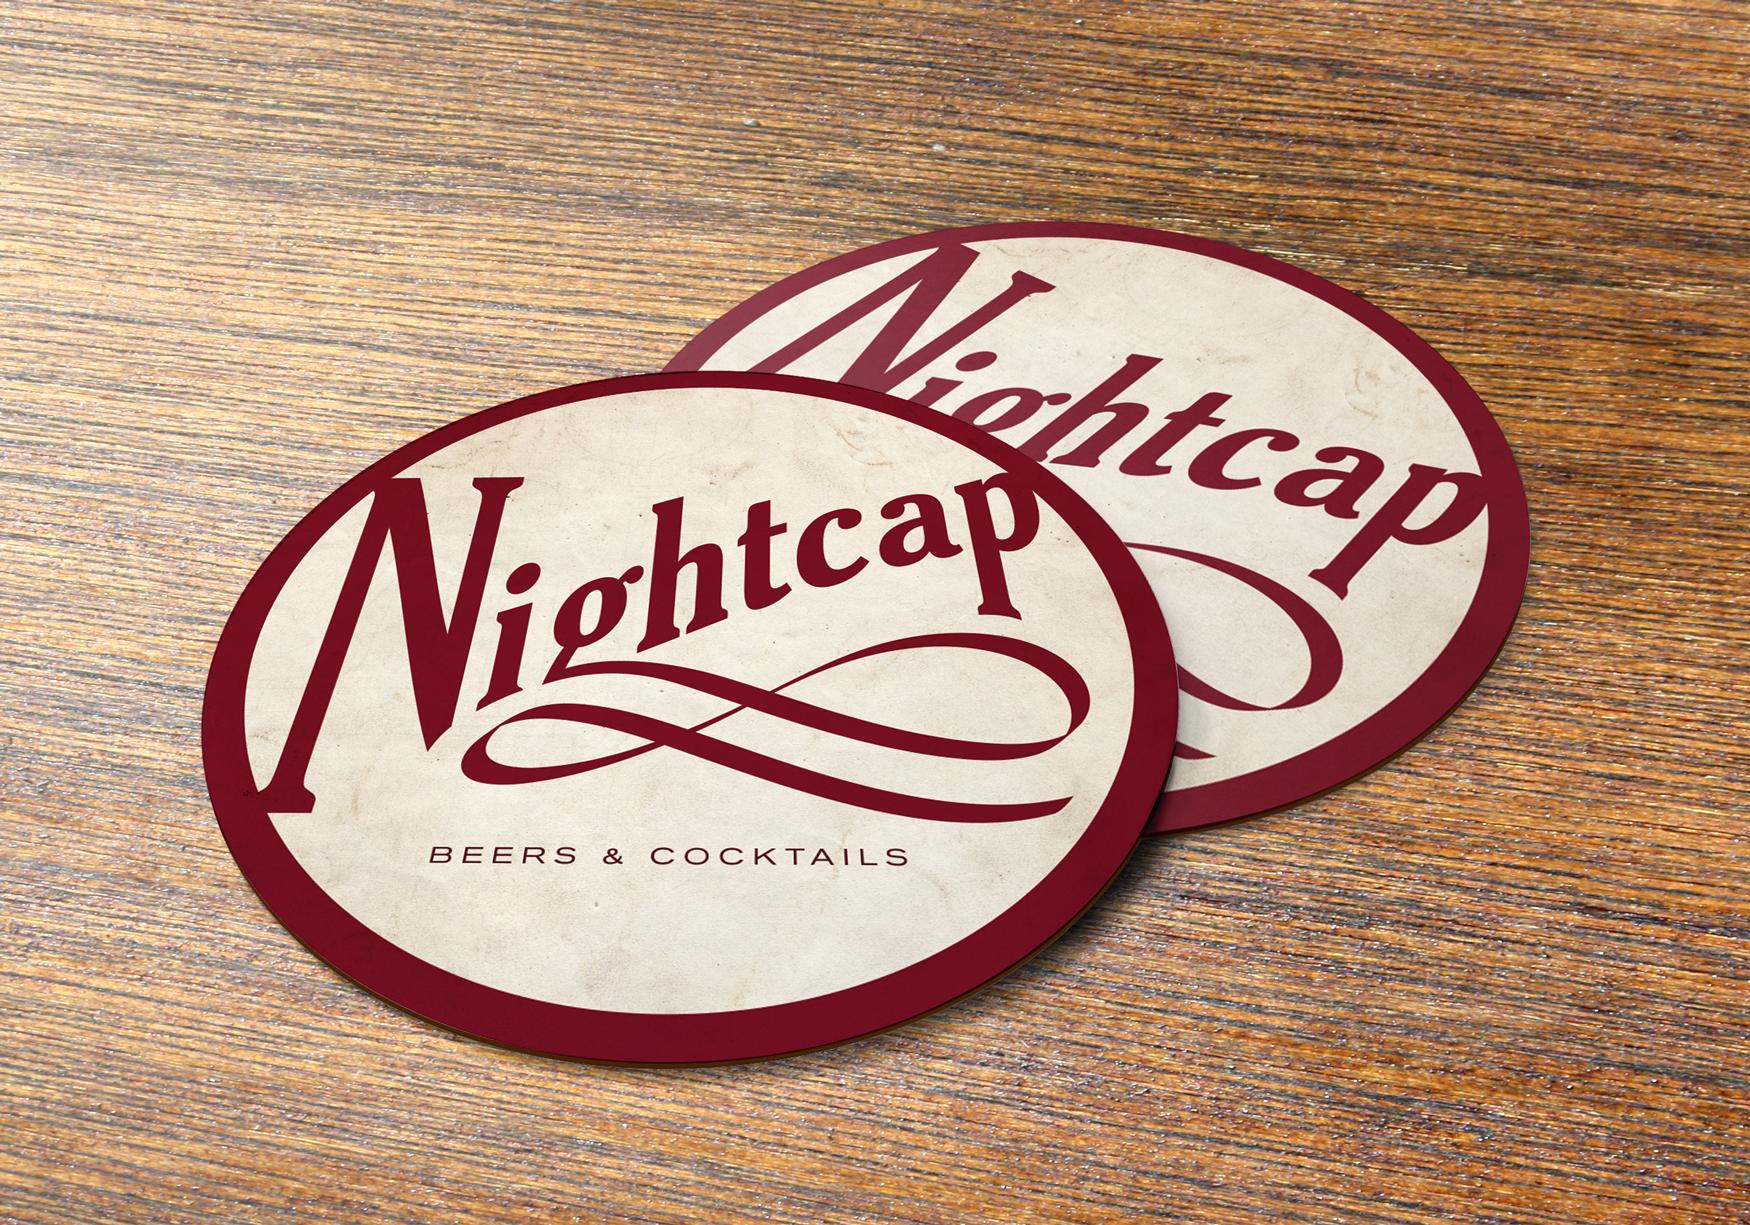 Nightcap-coaster_mockup2